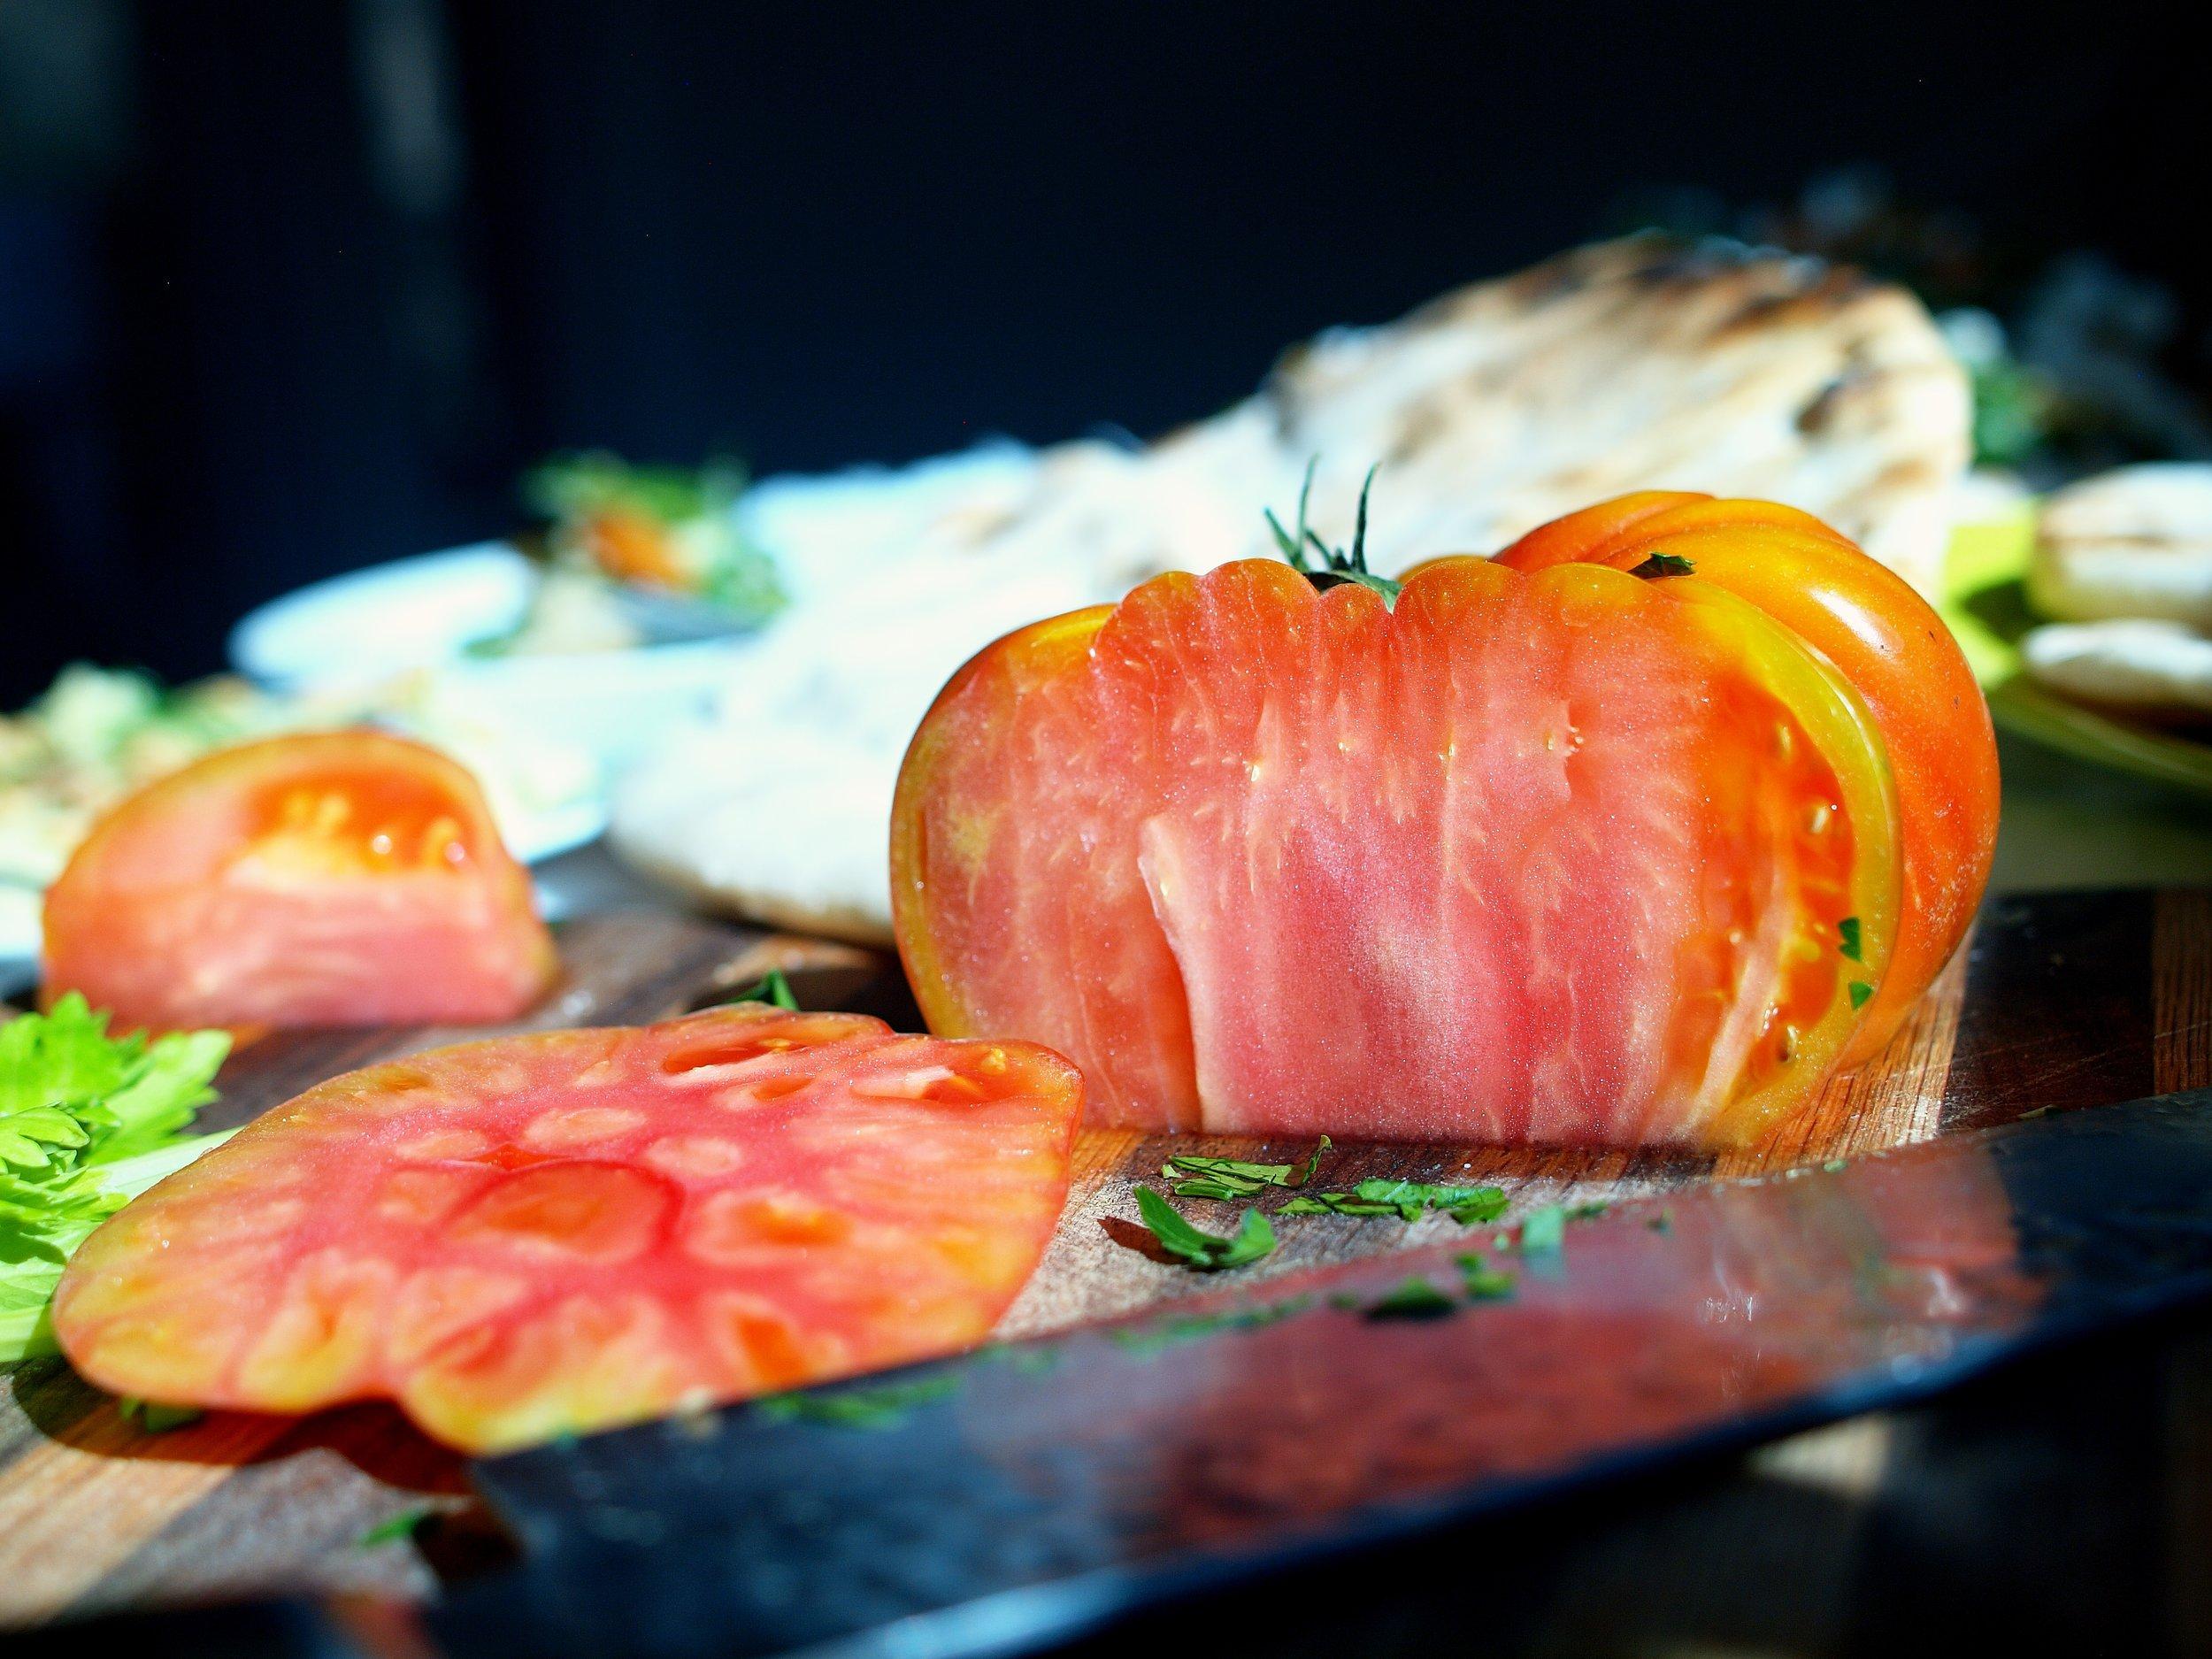 Chopping_Tomato.jpg